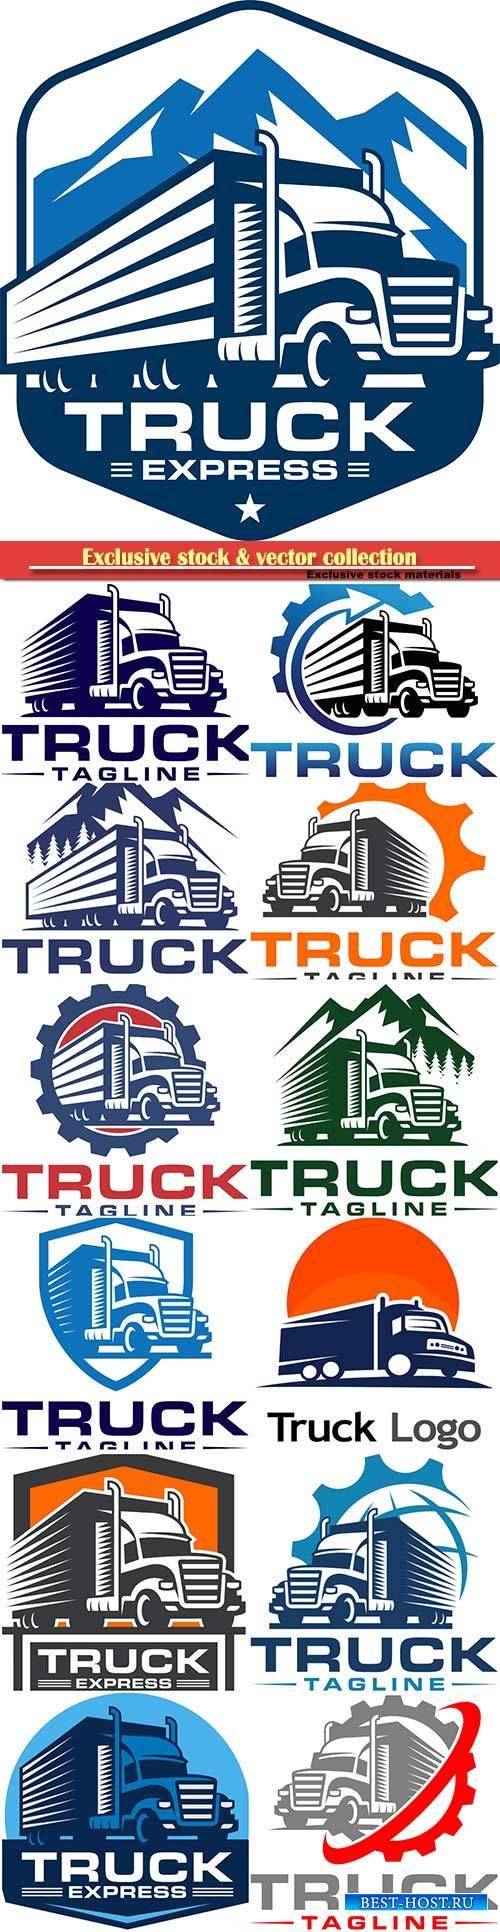 Truck tagline vector logo